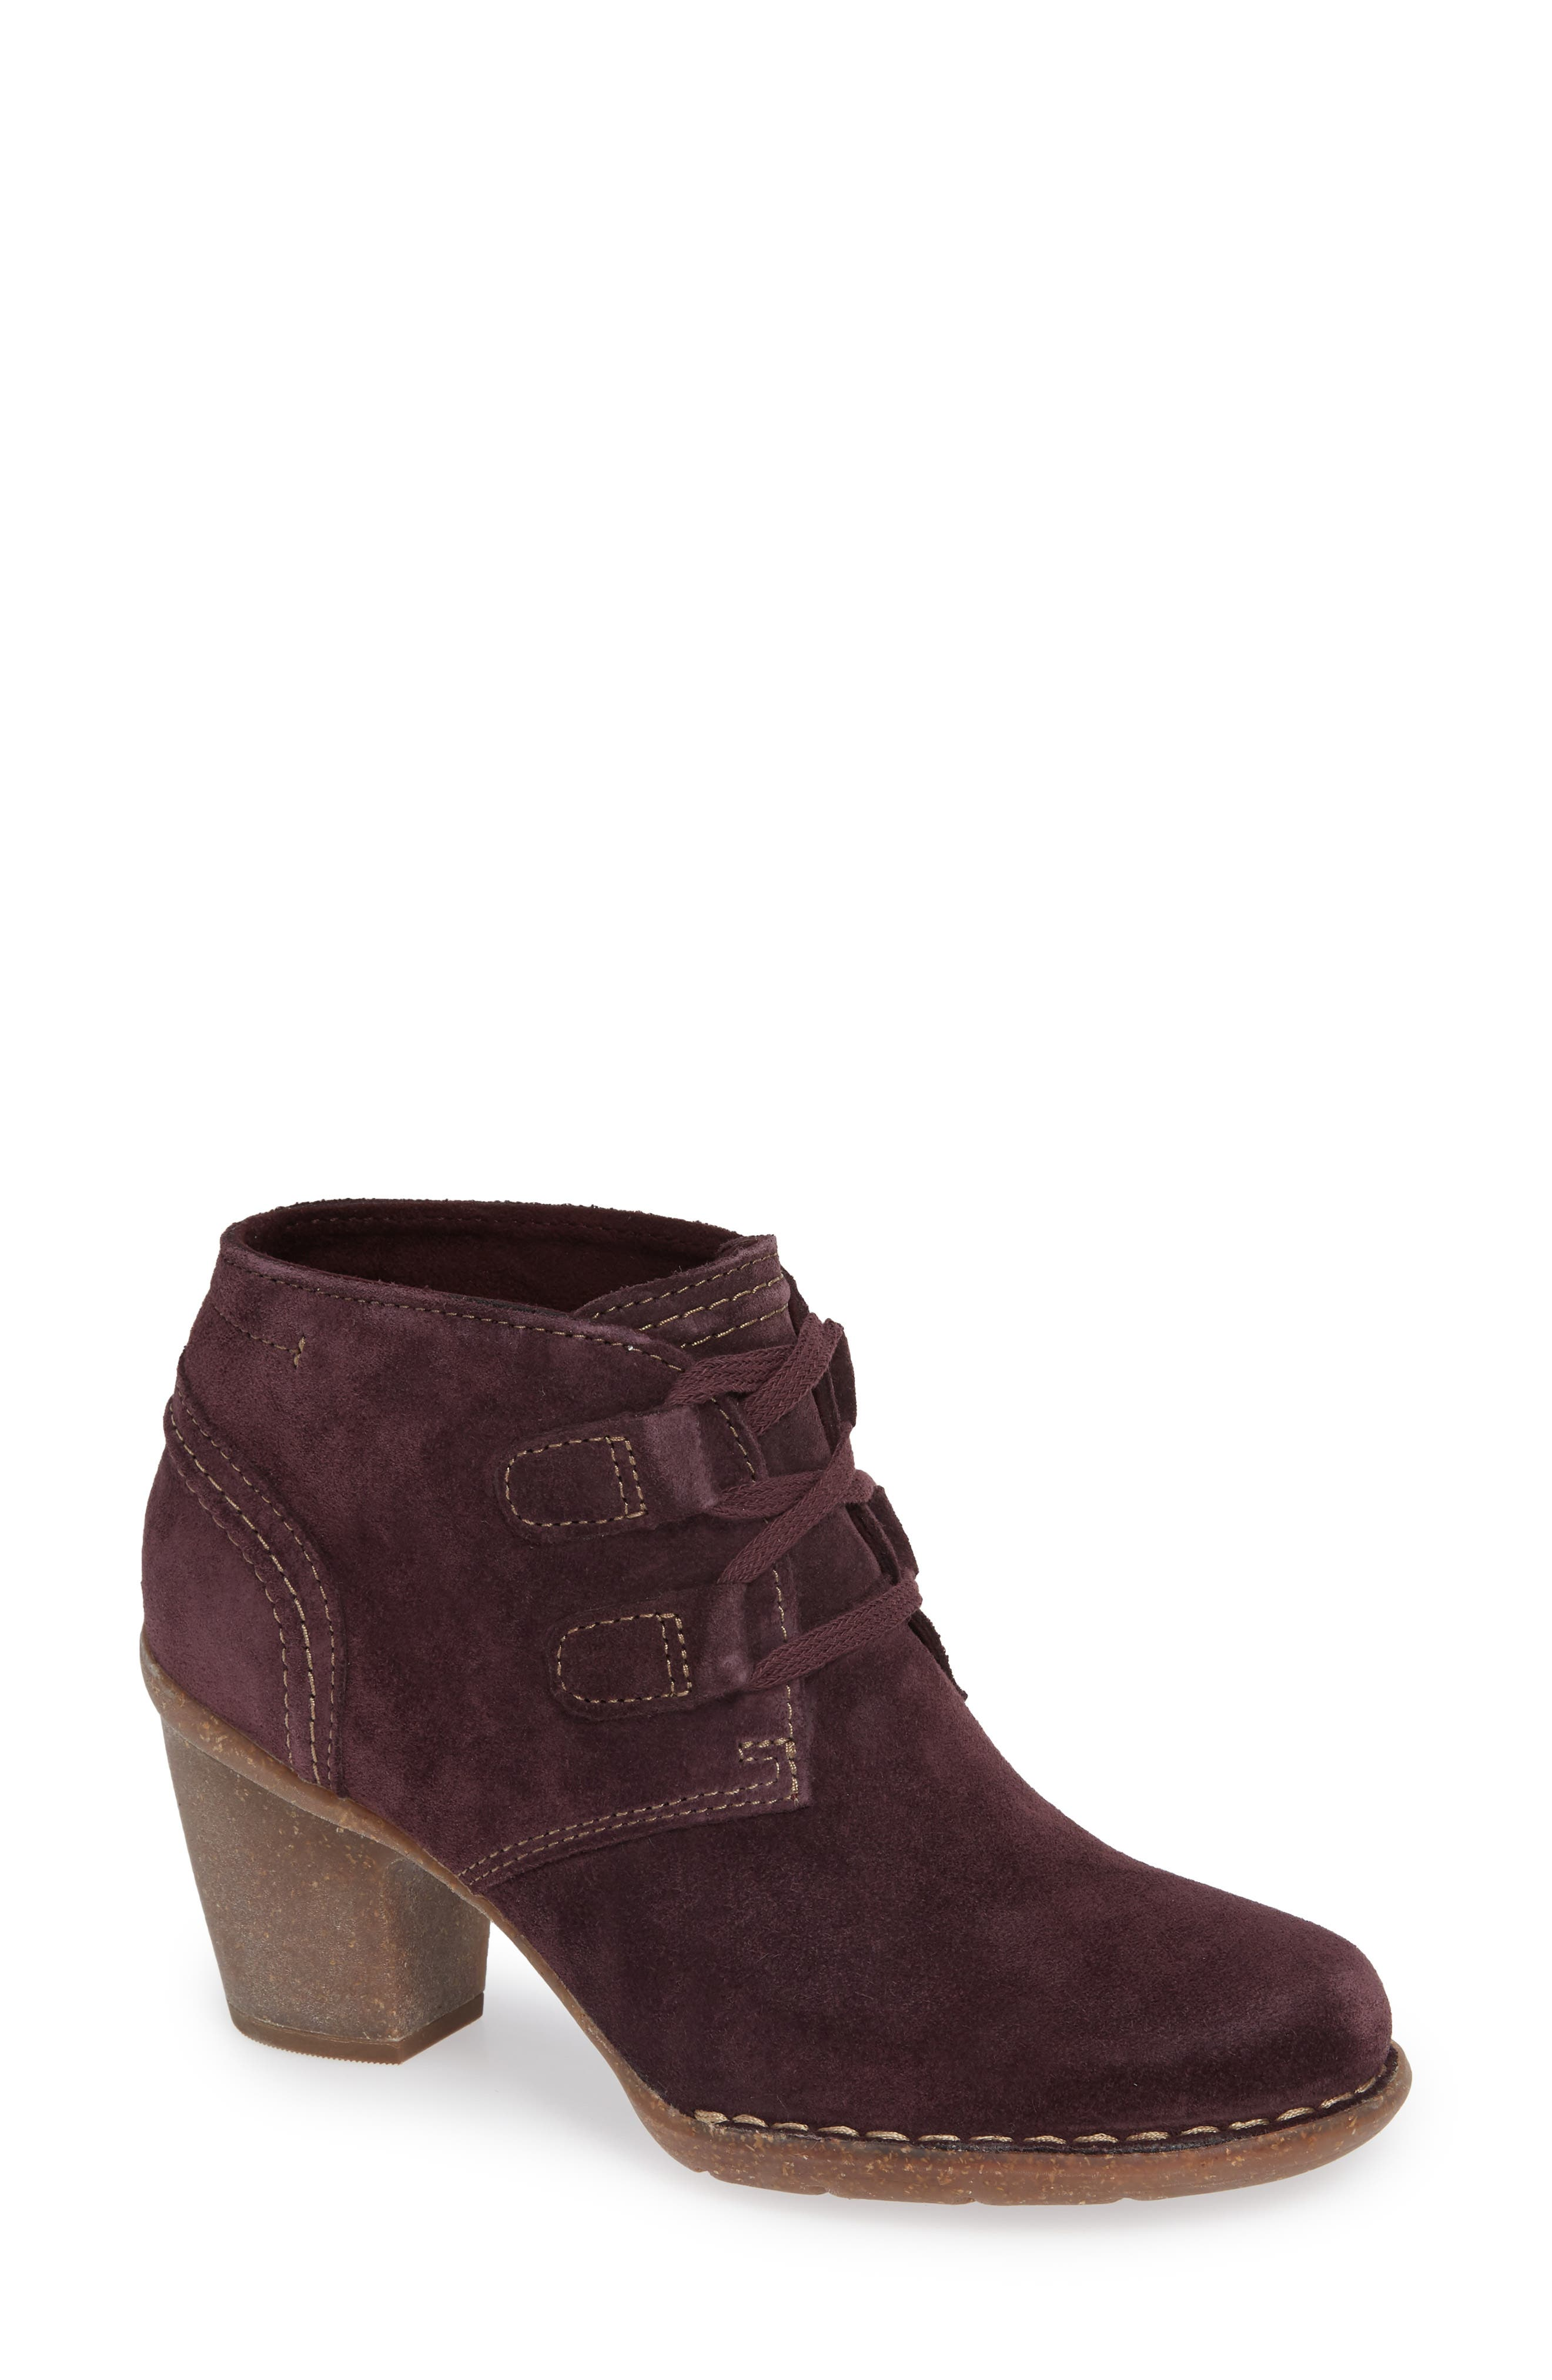 'Carleta Lyon' Ankle Boot,                         Main,                         color, AUBERGINE SUEDE